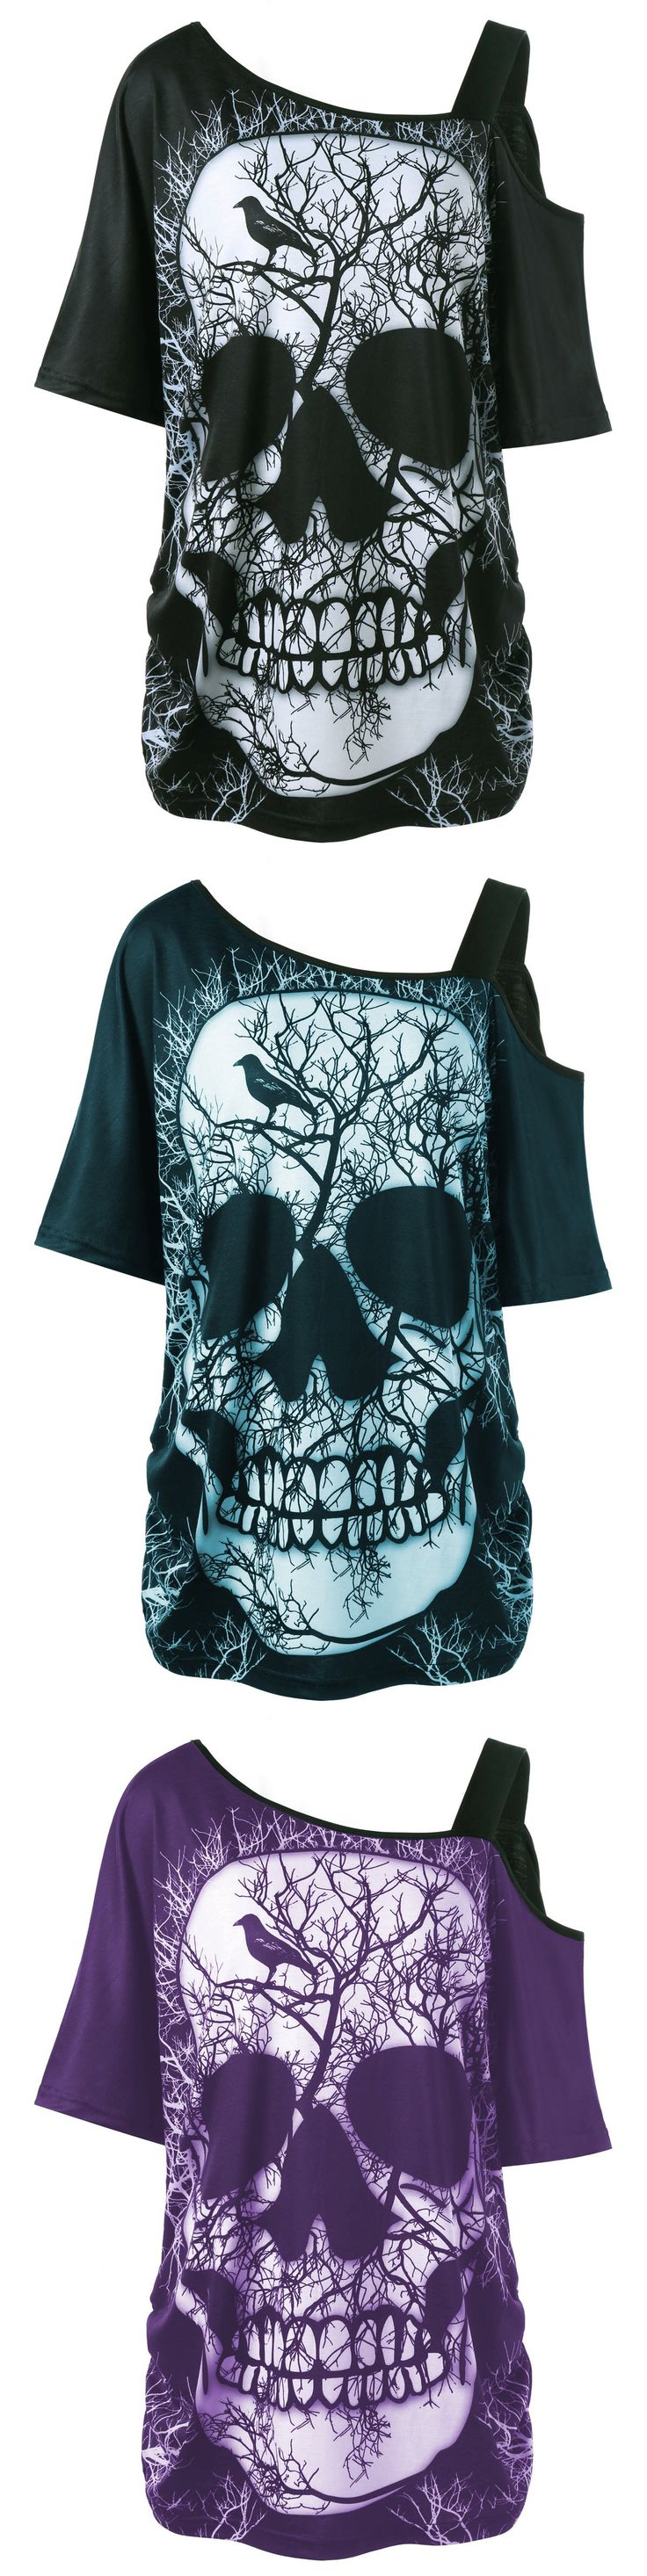 $8.5,Plus Size Skew Collar Skull T-shirt - Black 3xl | Rosewholesale, rosewholesale.com,rosewholesale clothes,rosewholesale shirts, rosewholesale dress, rosewholesale dress plus size, rosewholesale plus size, rosewholesale.com clothing,plus size, tops,tshirts | #rosewholesale #plussize #tops #tshirts